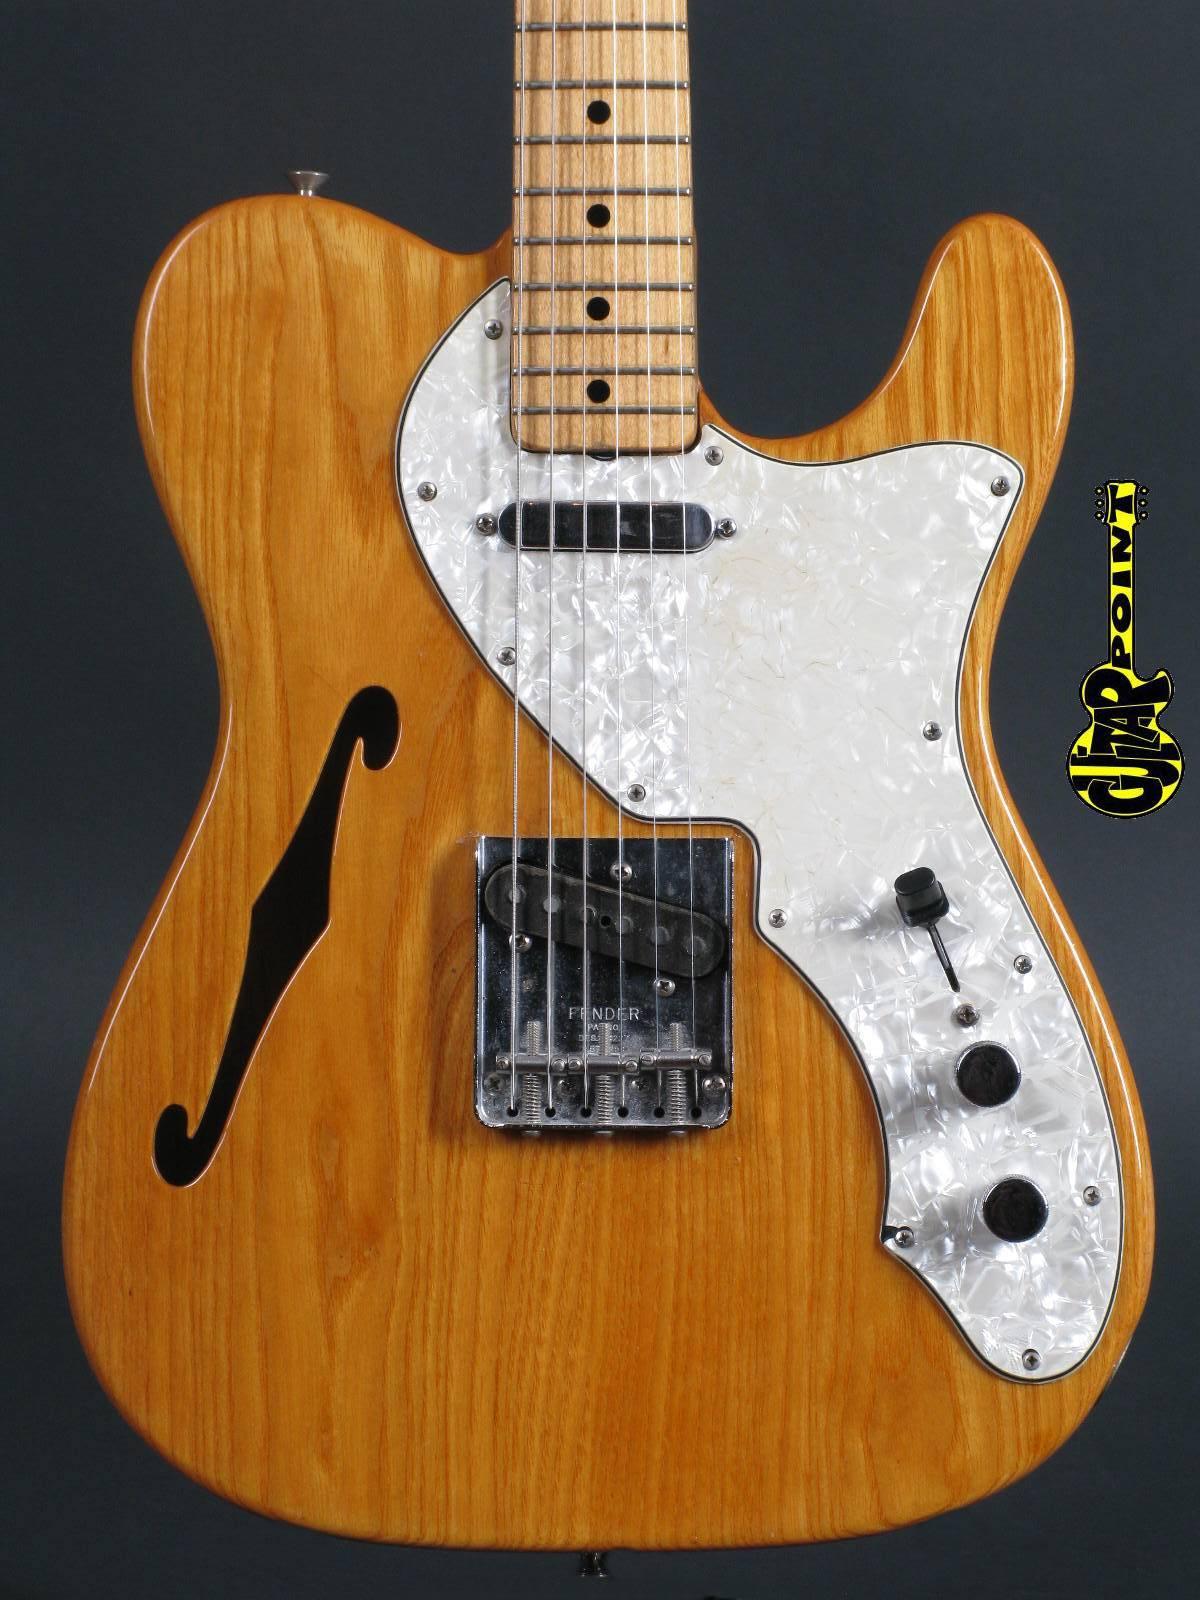 1971 Fender Thinline Telecaster - Natural